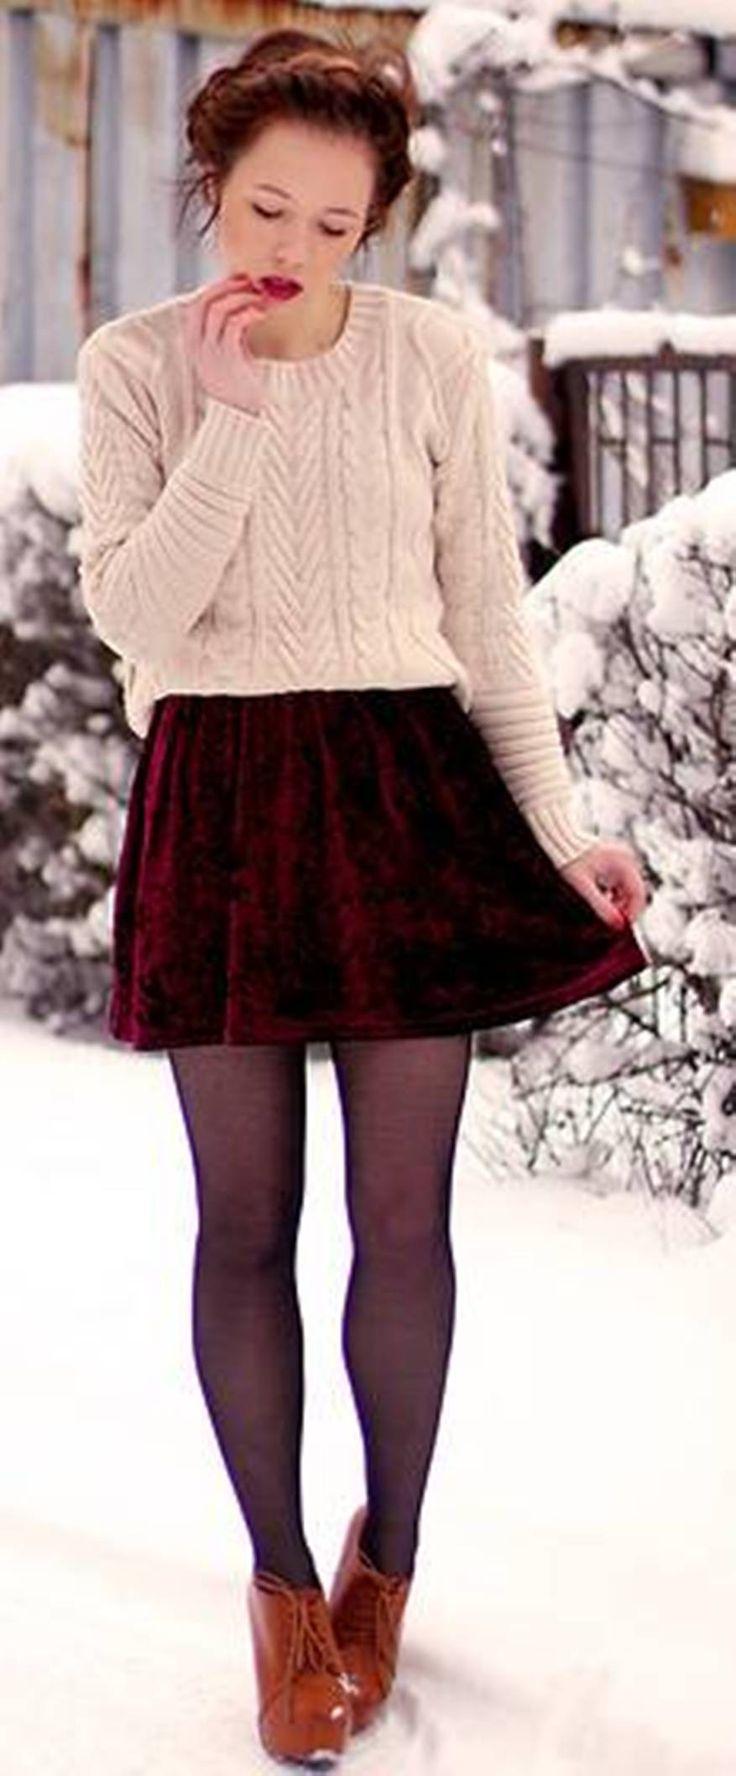 cute idea how to wear a dresses in winter